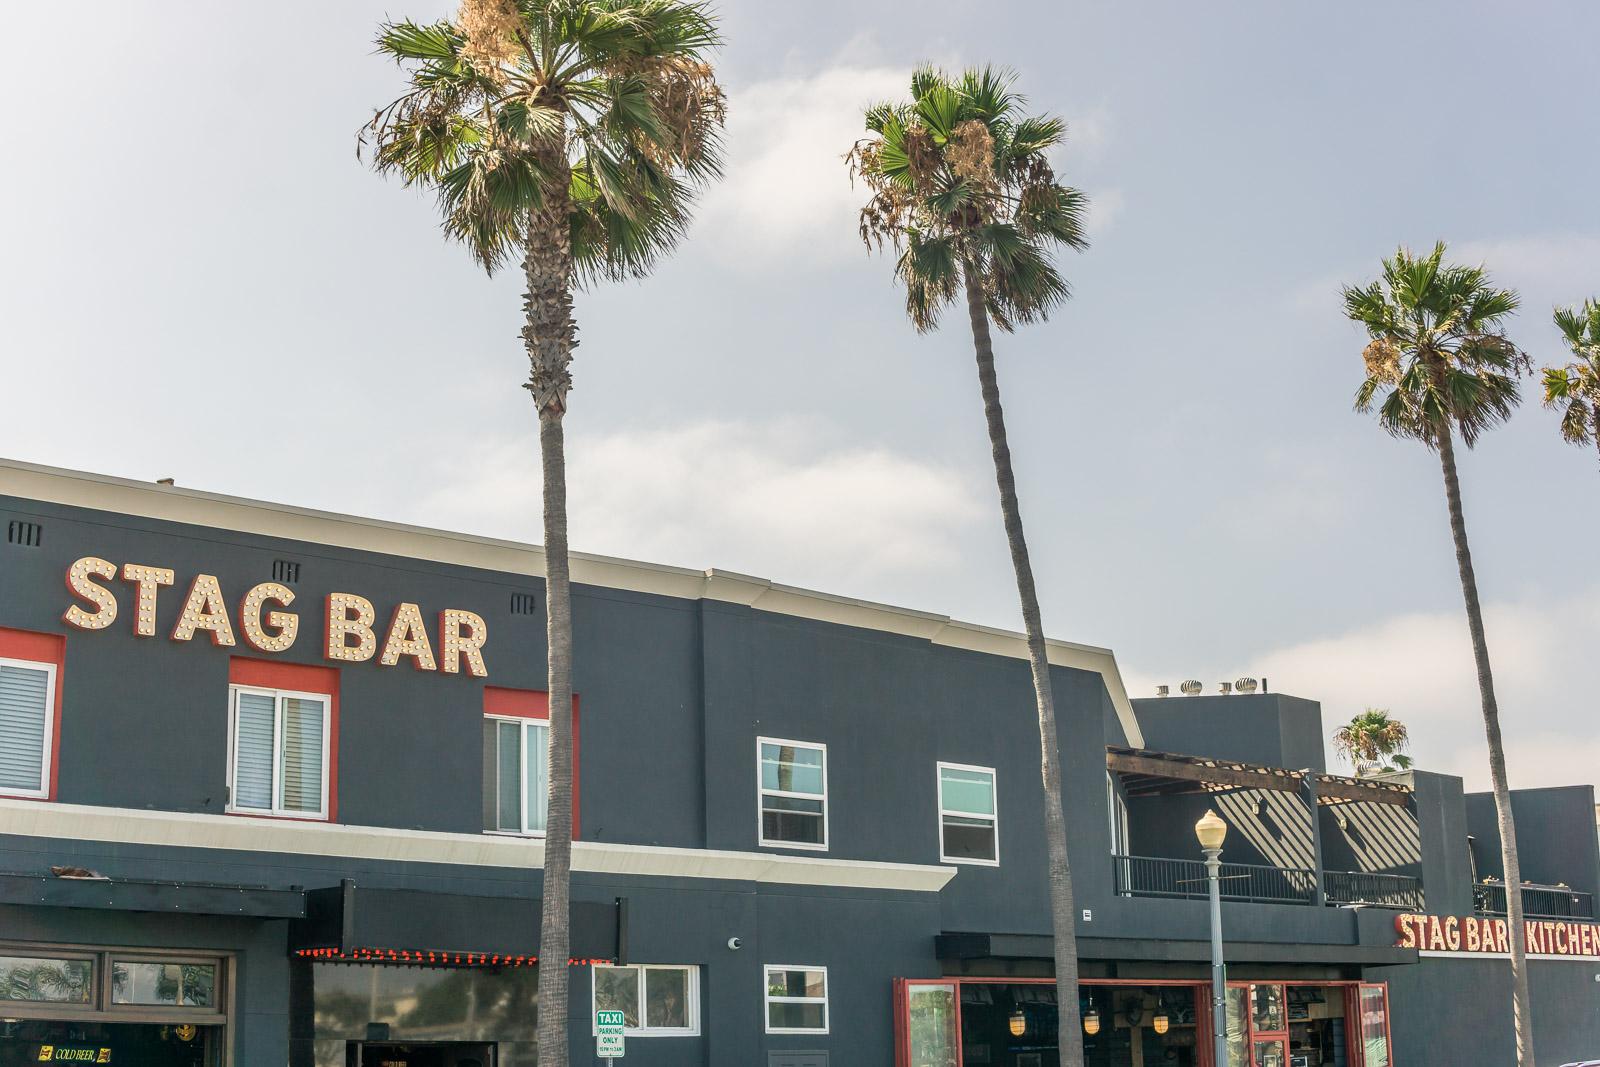 Balboa Peninsula stag bar and restaurantAt Newport Beach pier